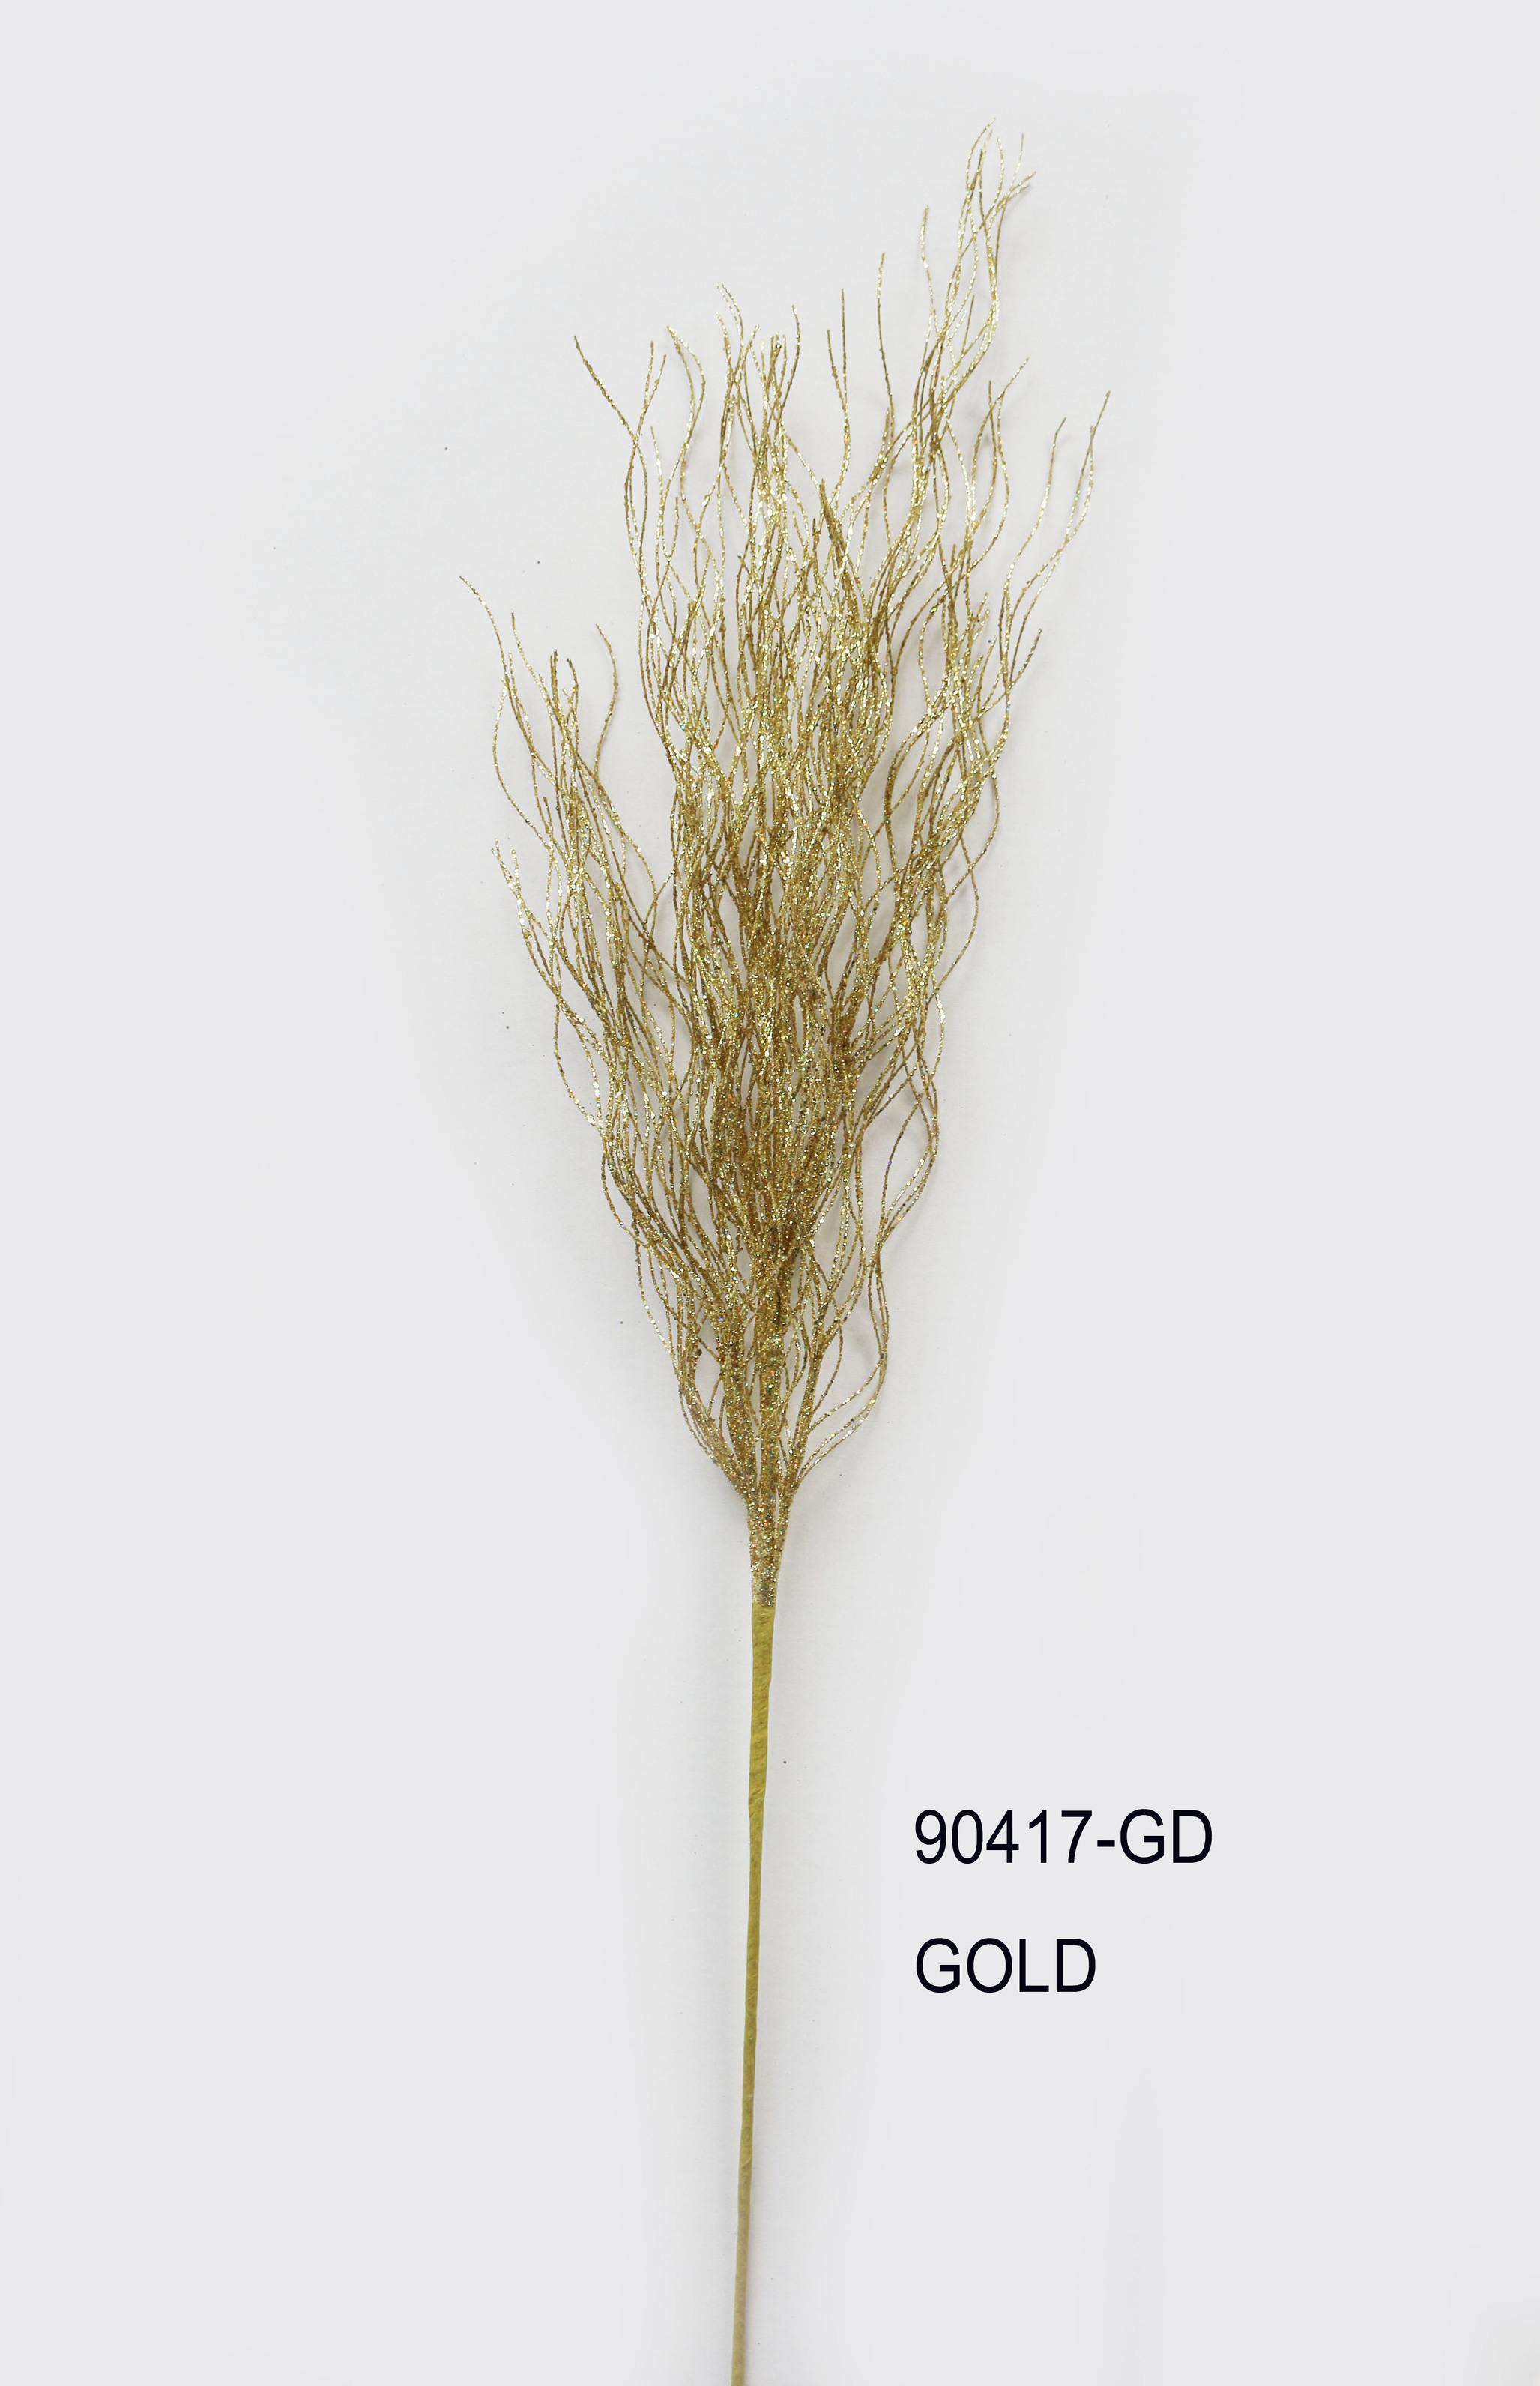 90417-GD